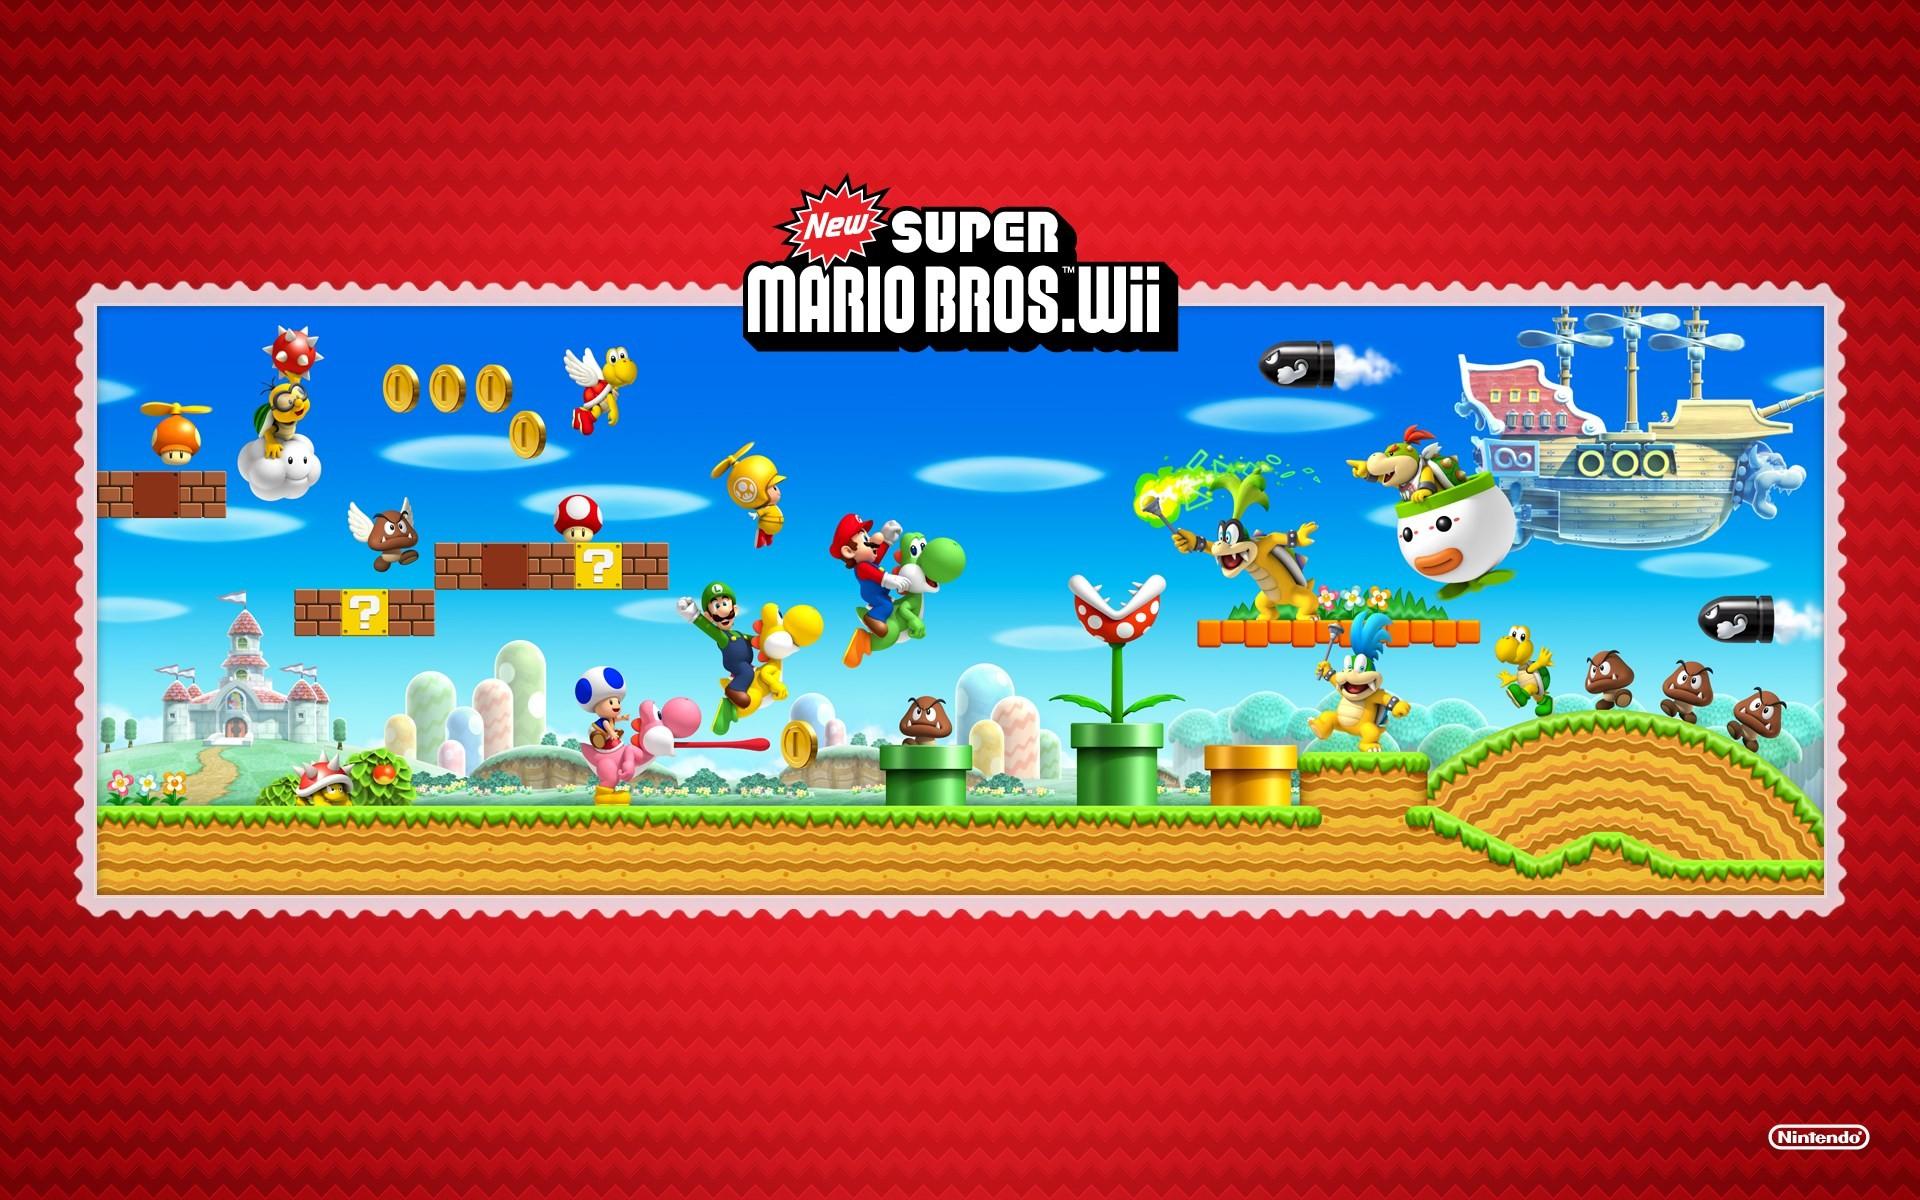 windows wallpaper New Super Mario Bros Wii by Waverley Thomas (2016-05-25